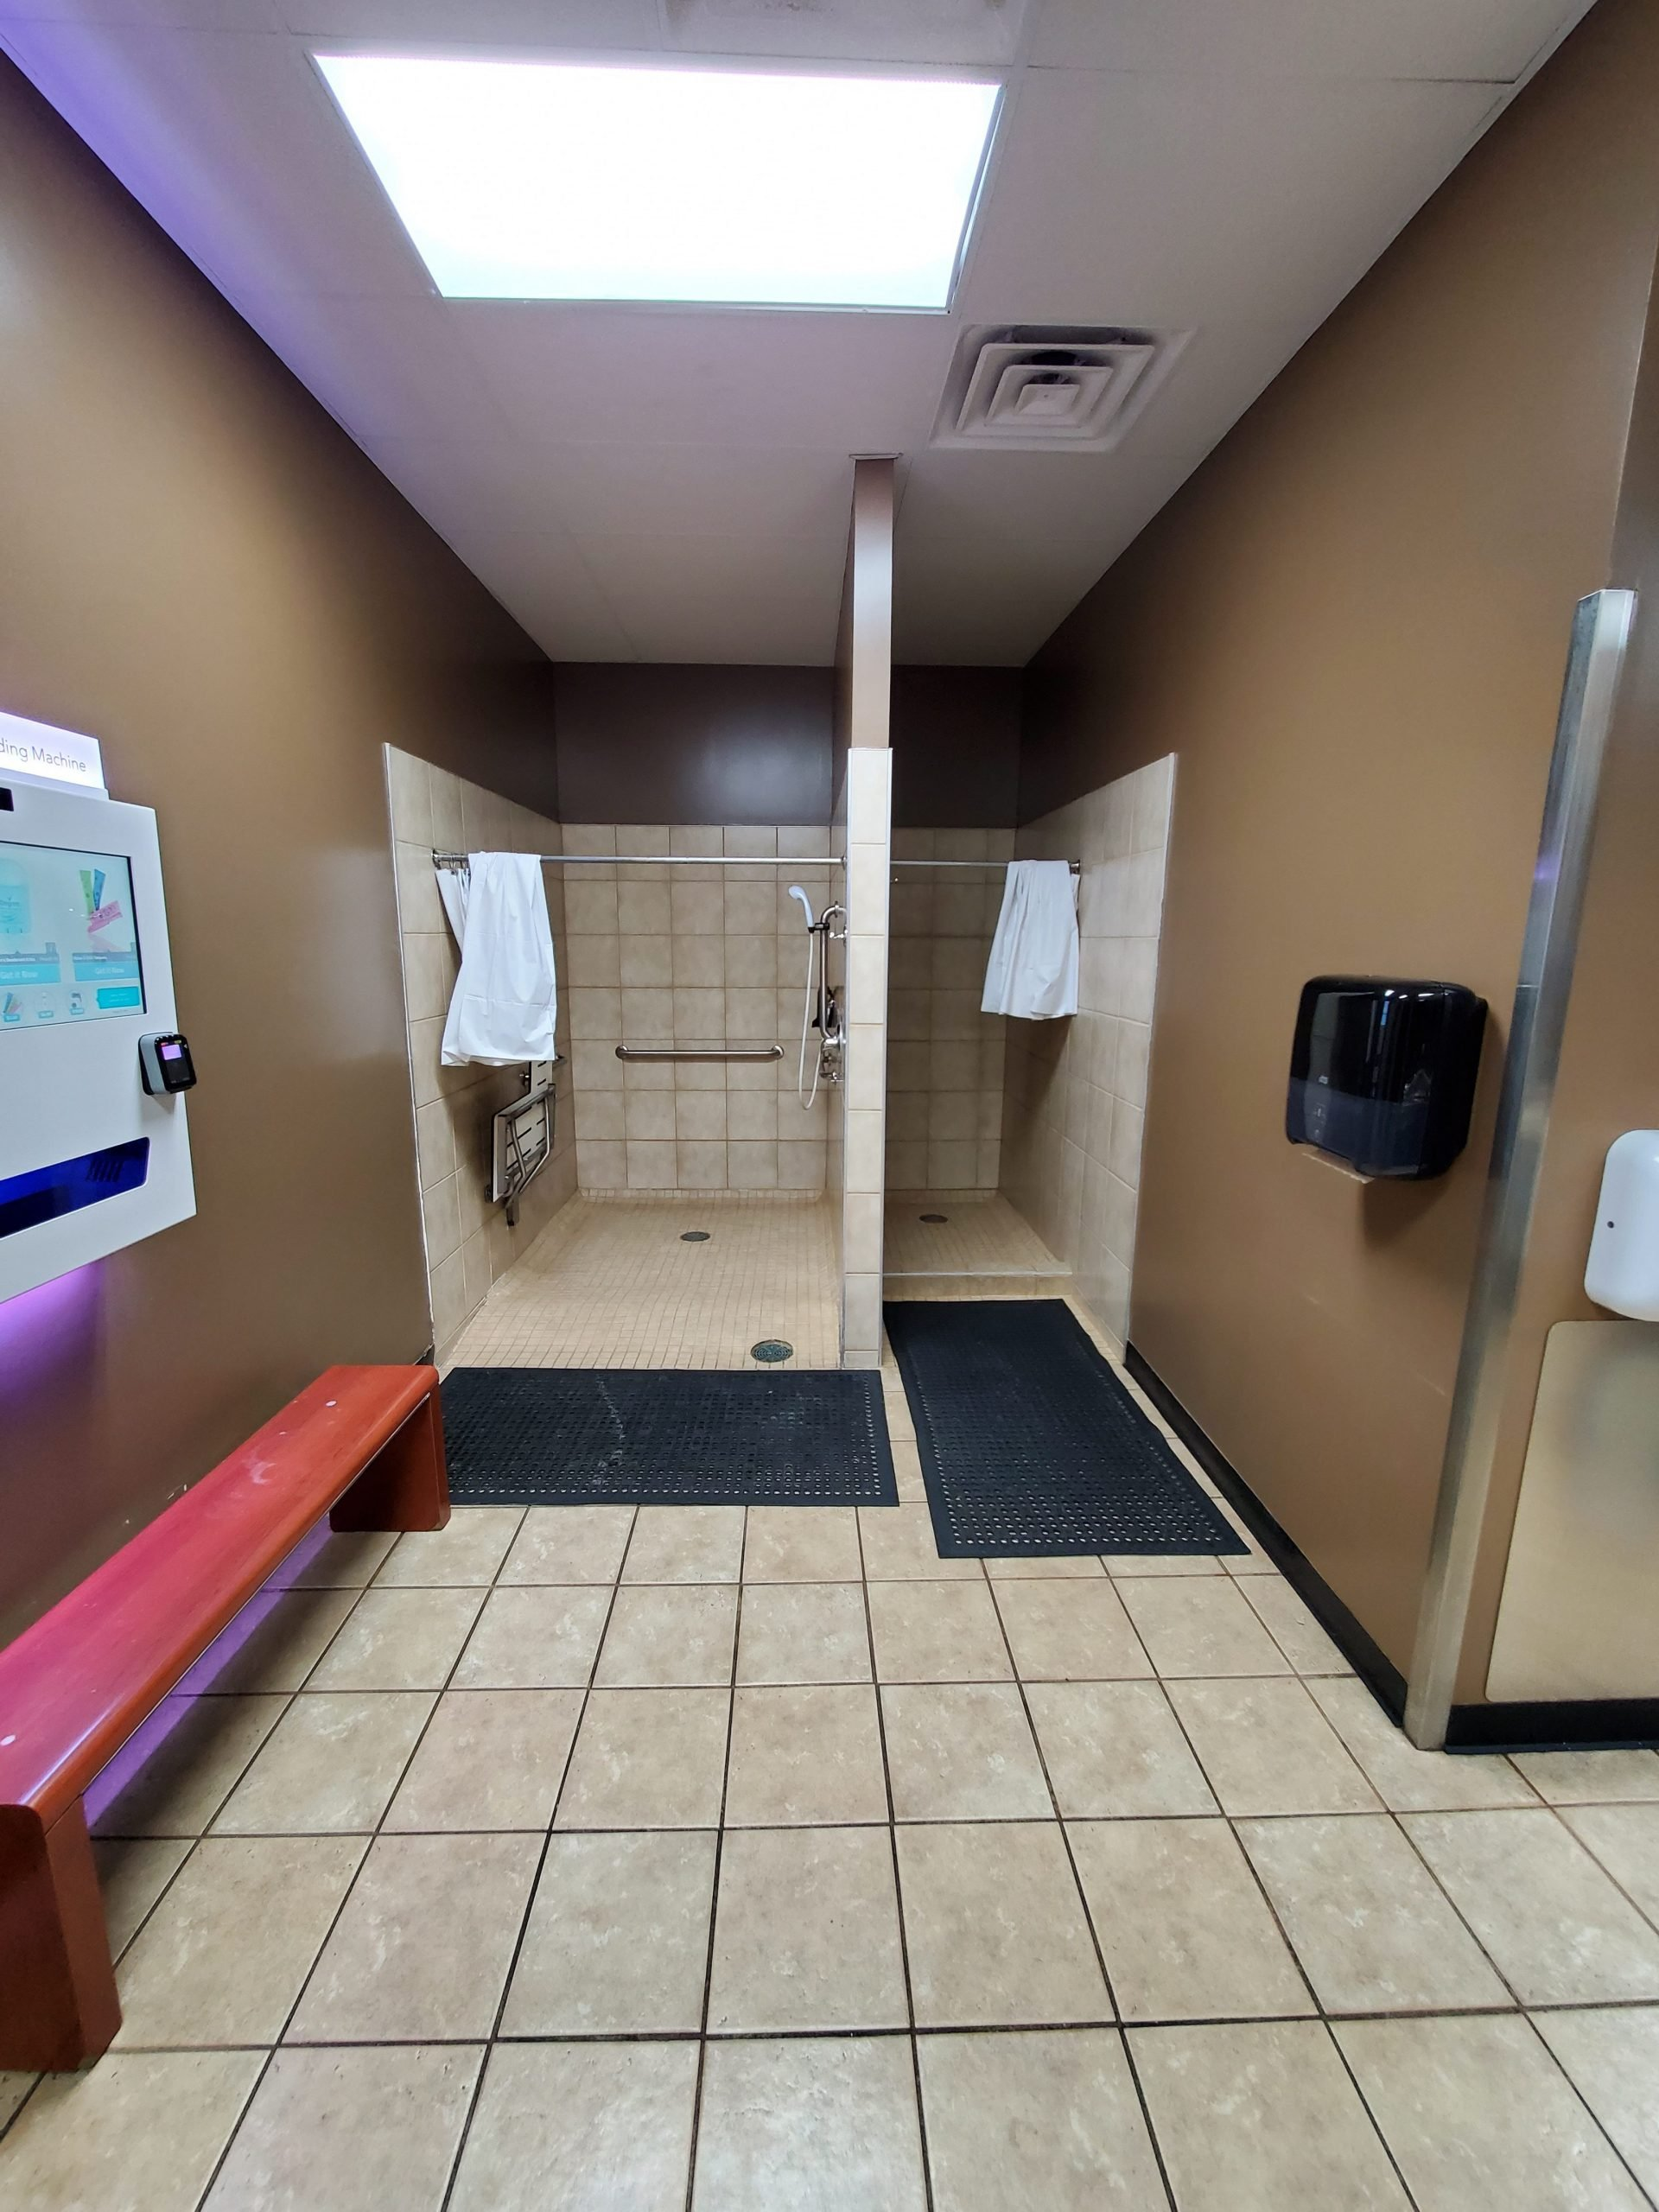 MFit Locker Rooms